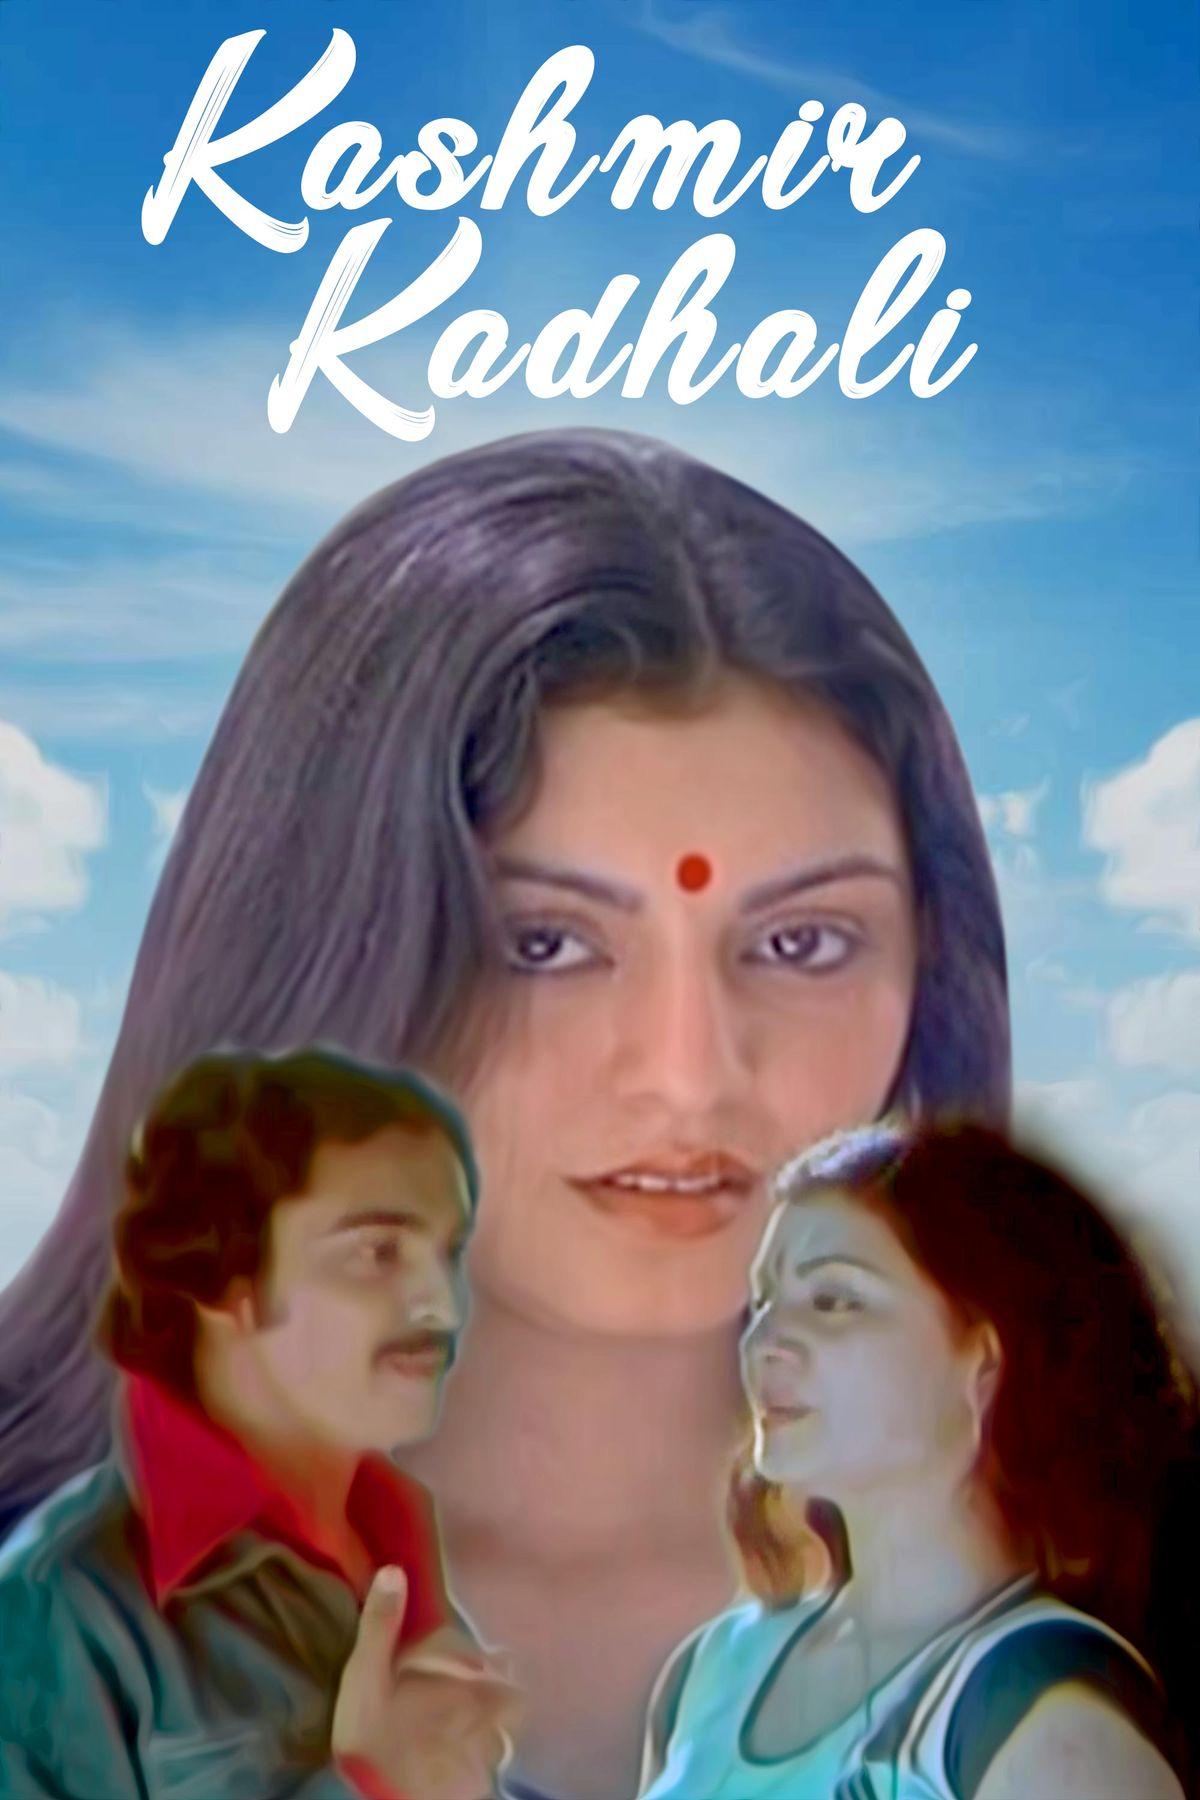 Kashmir Kadhali